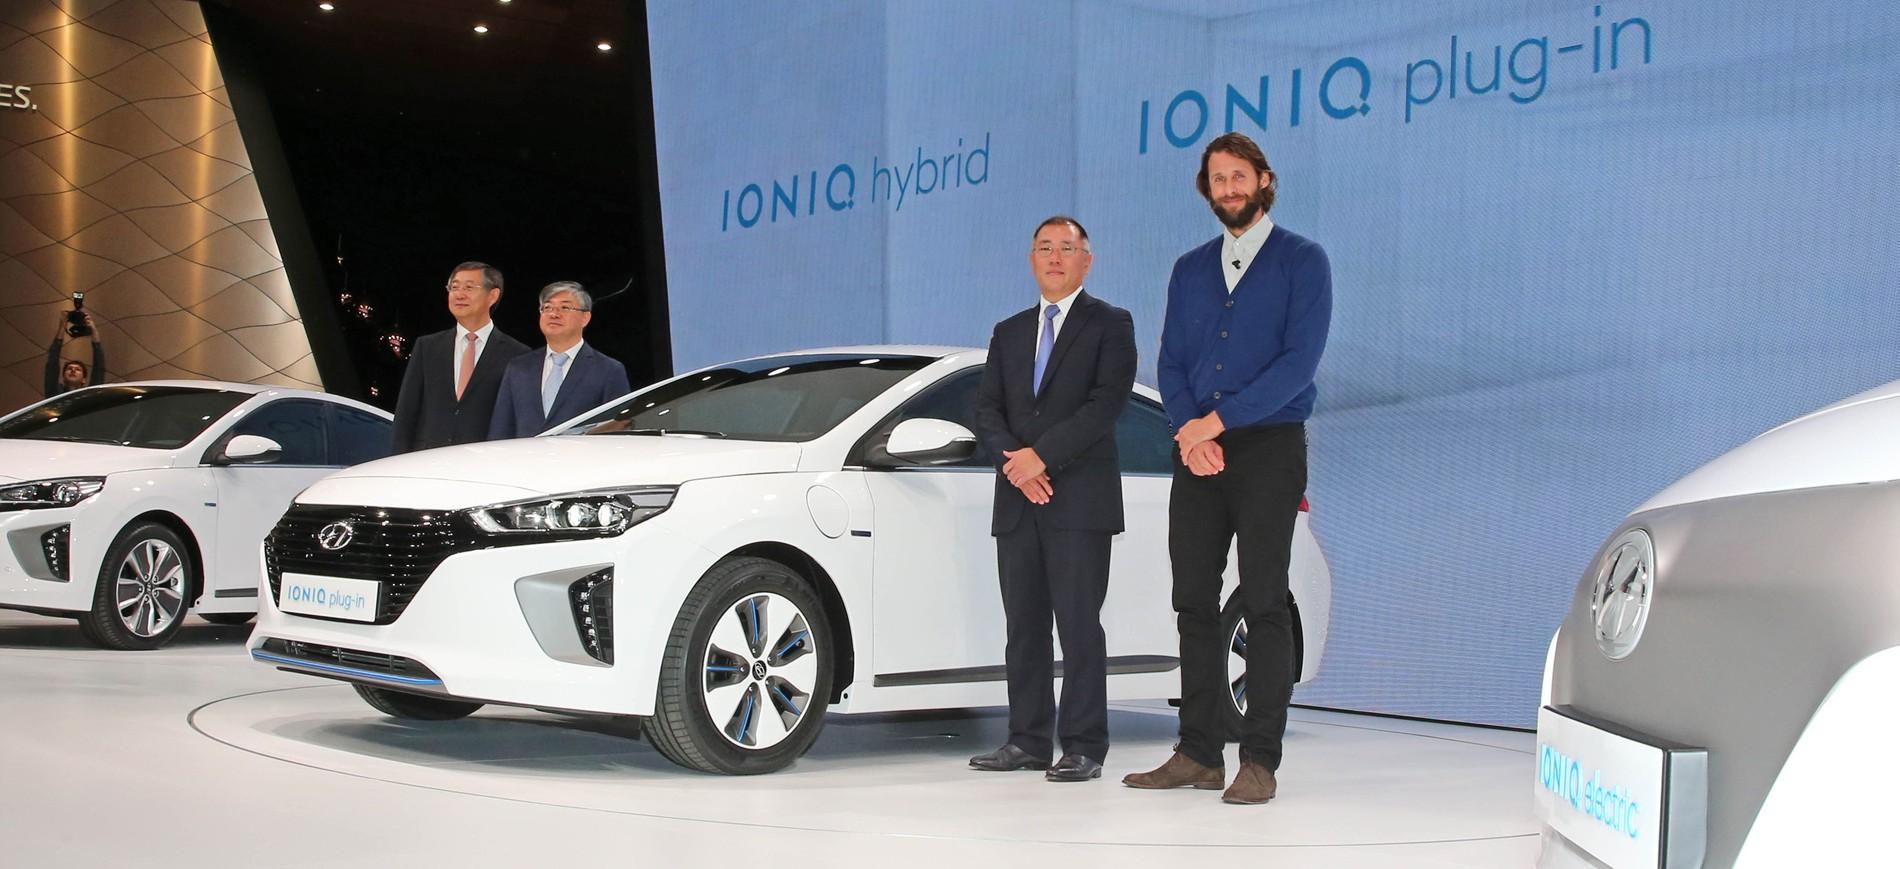 Hyundai at 2016 Geneva International Motor Show 2